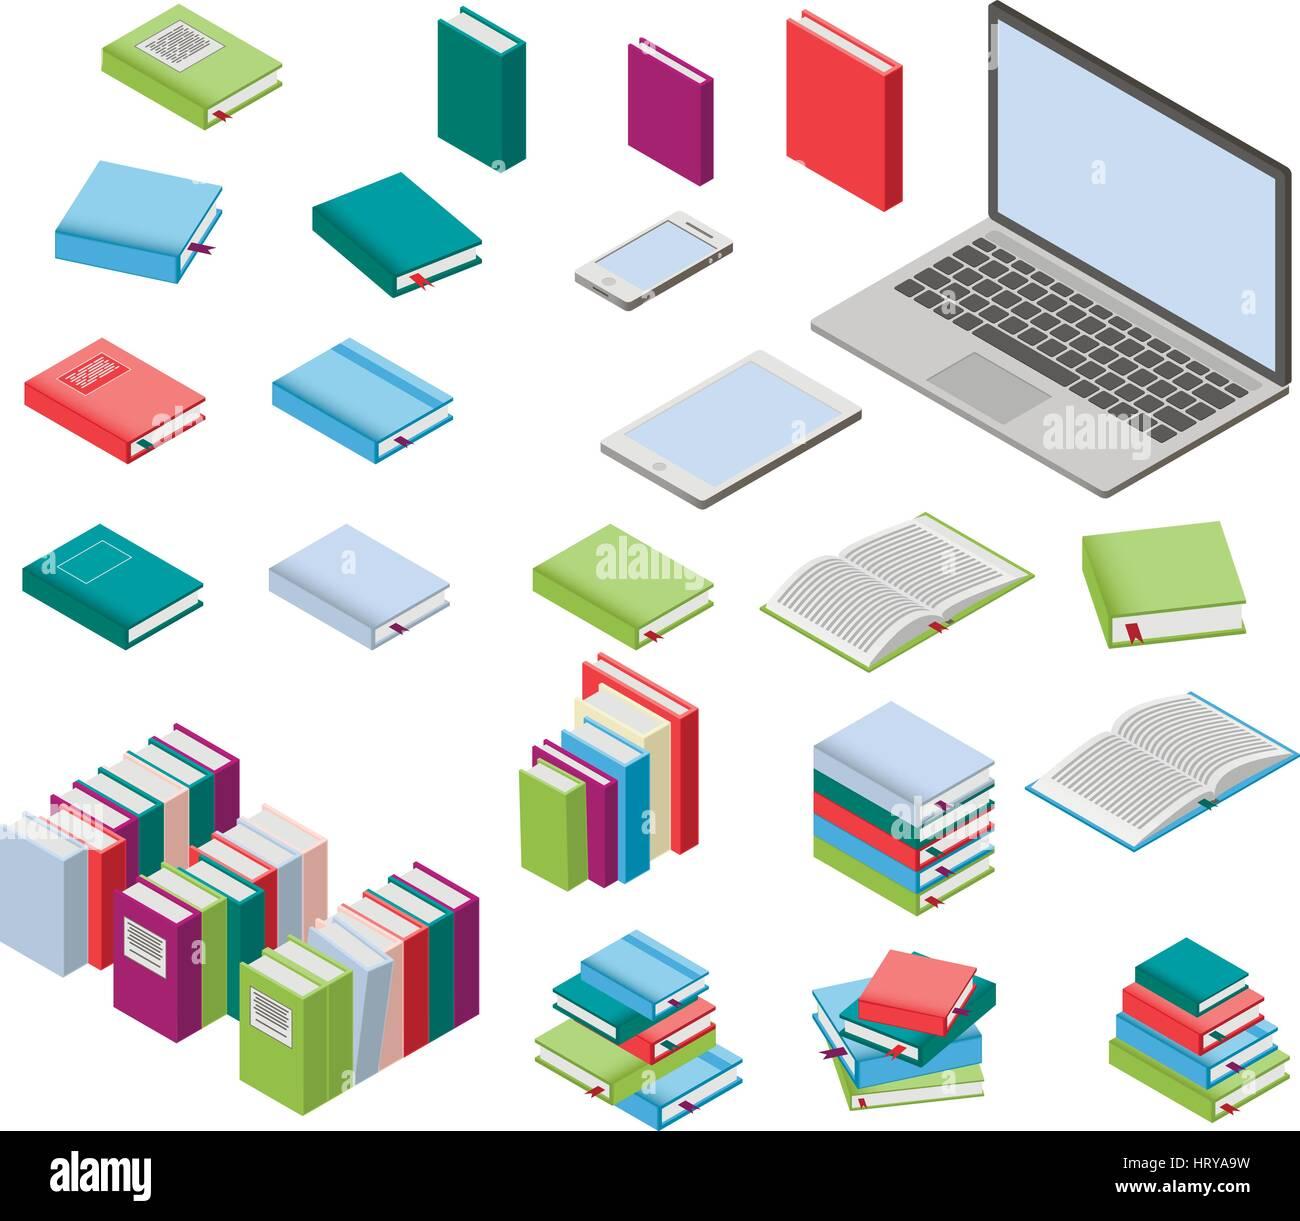 Isometric books and laptop set - Stock Image